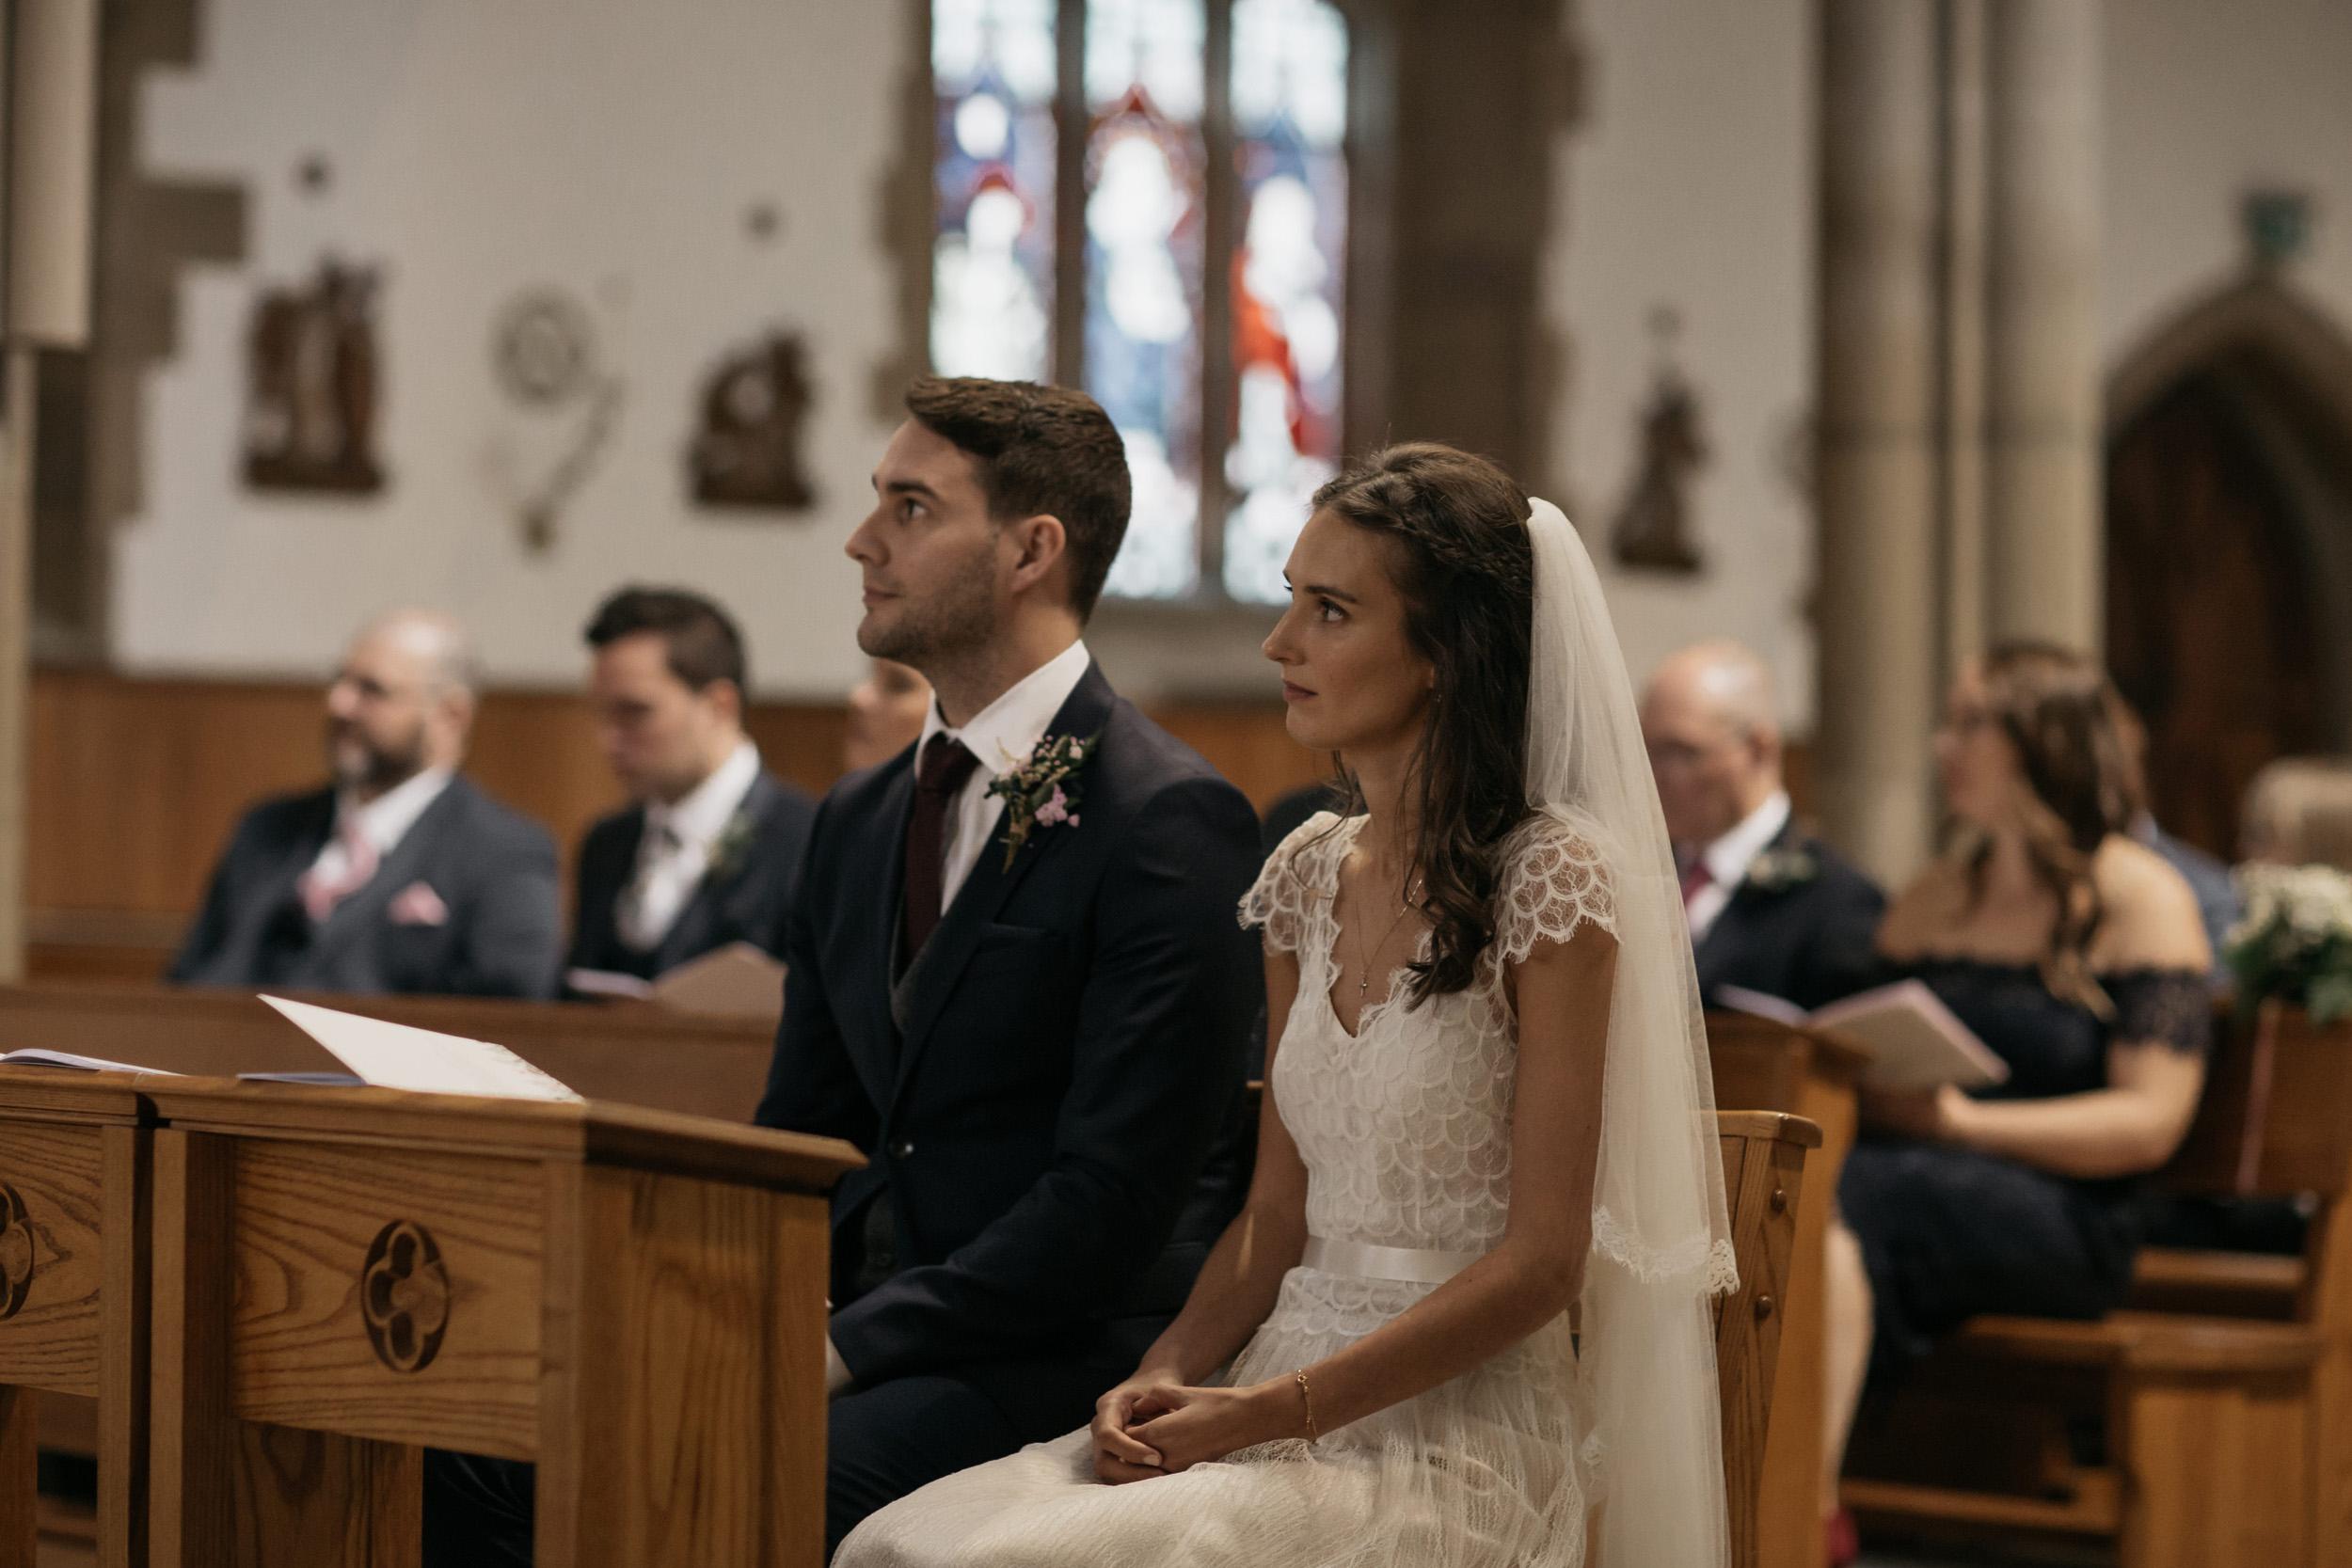 Joasia-Kate-Beaumont-Bohemian-Lace-Wedding-Dress-Peak-District-Sheffield-Wedding-11.jpg